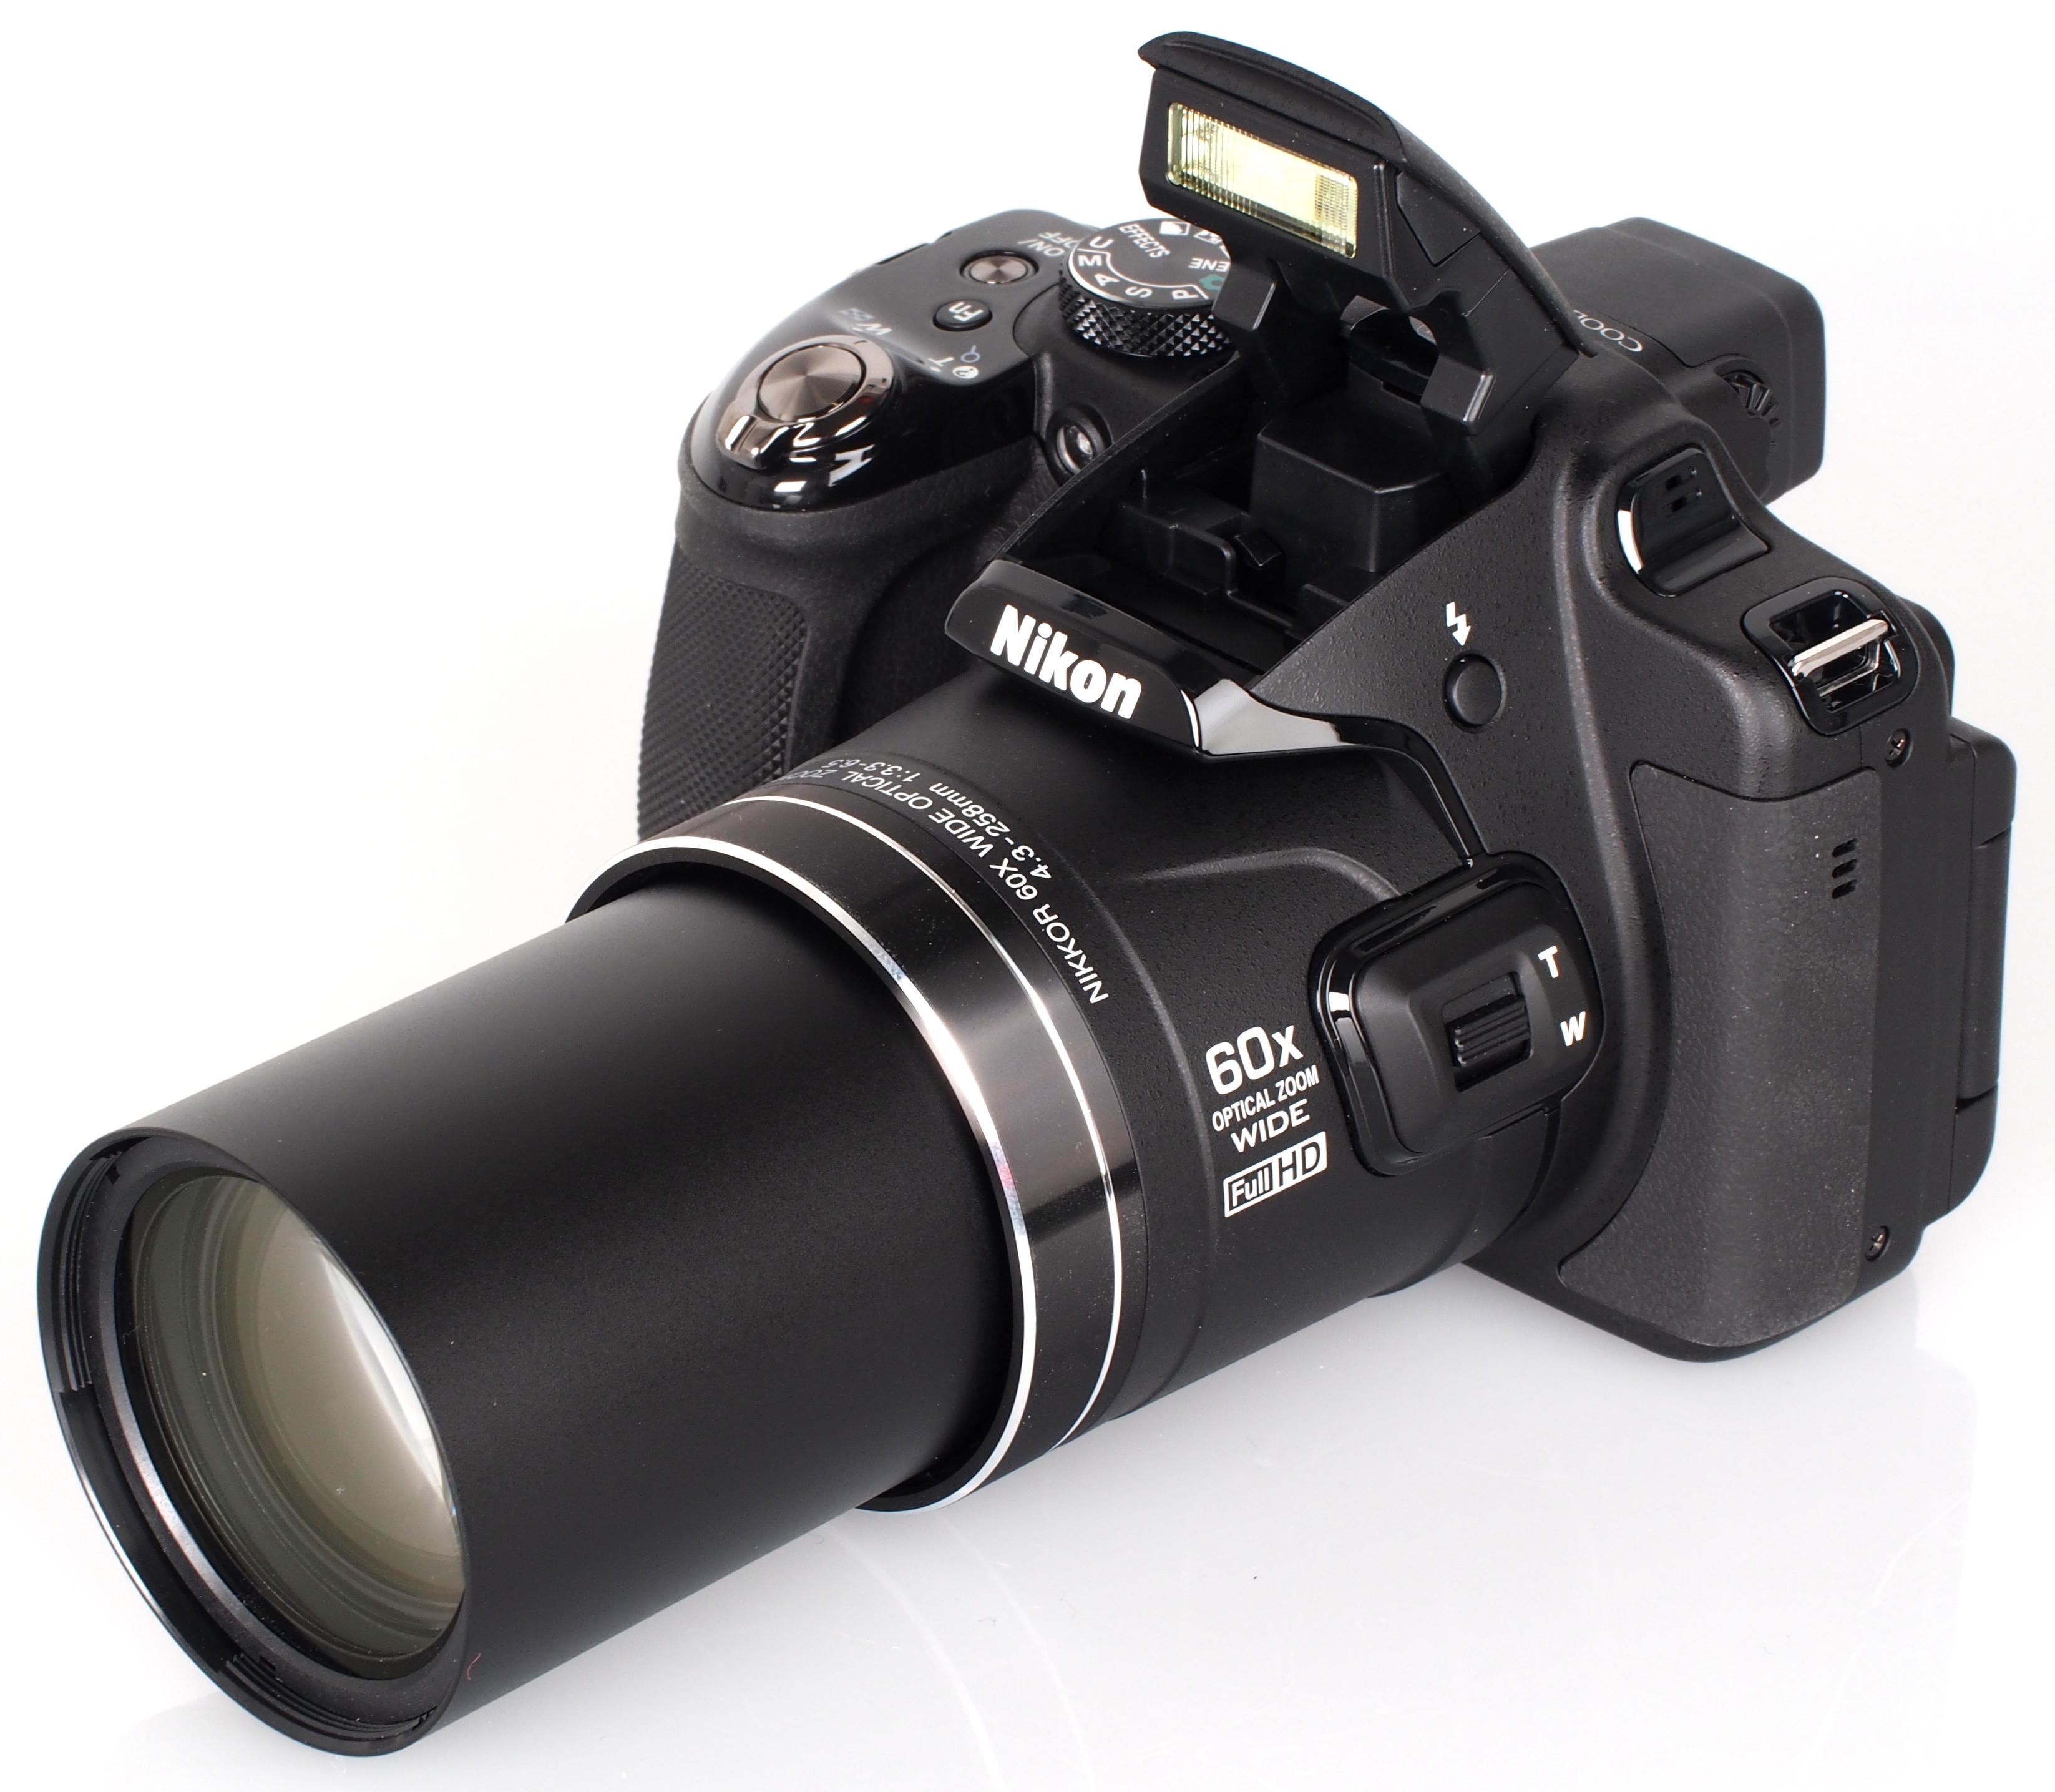 Best digital camera for high resolution photos